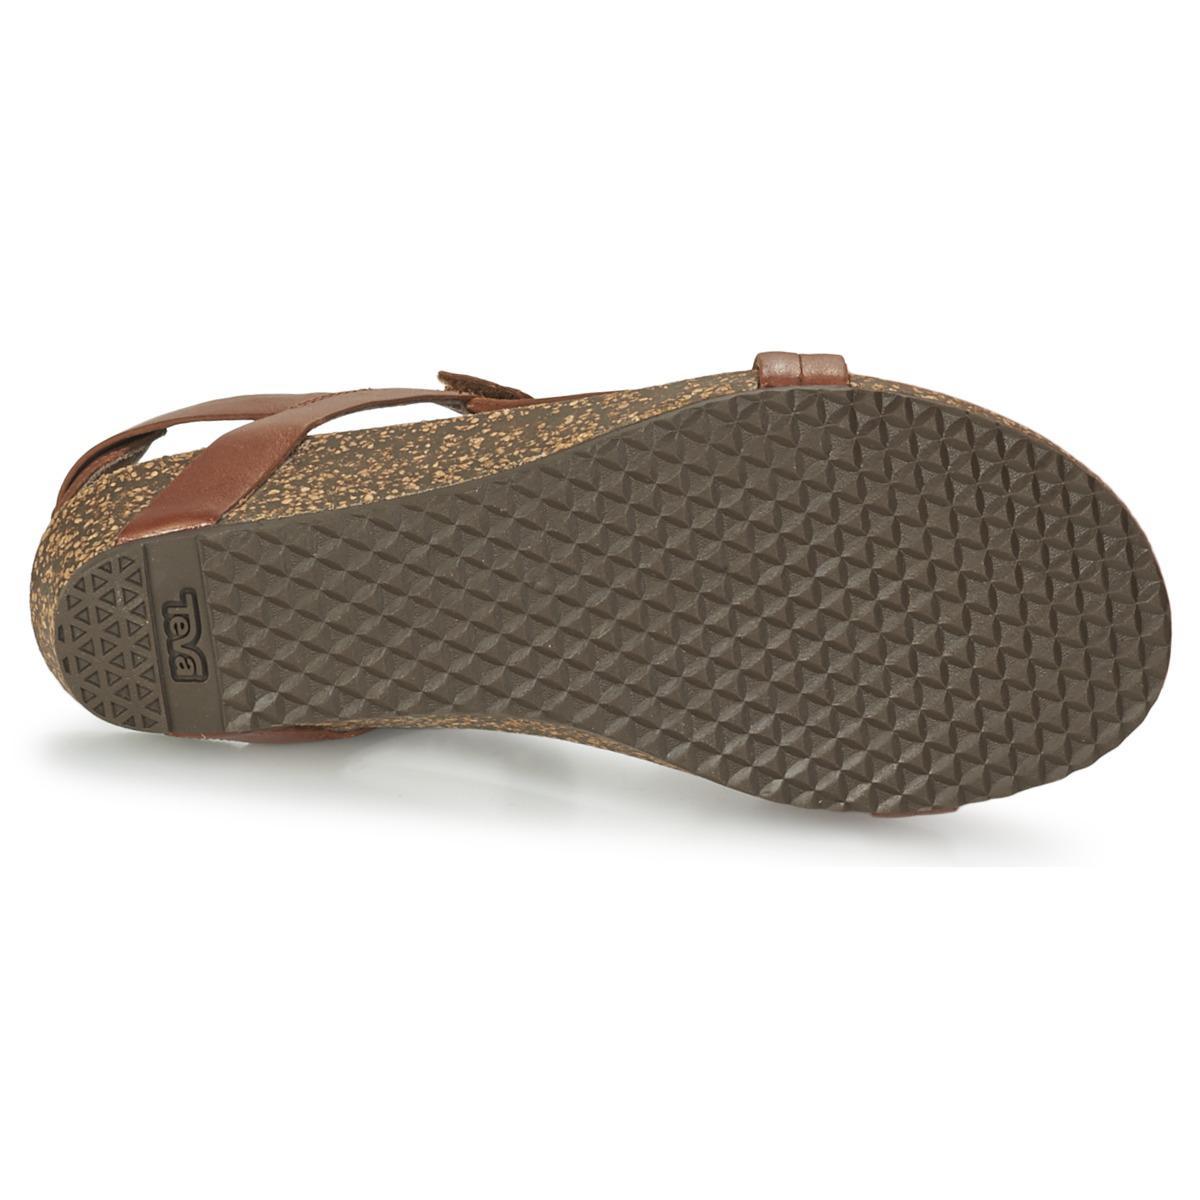 0db3491eb1d1 Teva Ysidro Universal - Metallic Women s Sandals In Brown in Brown ...